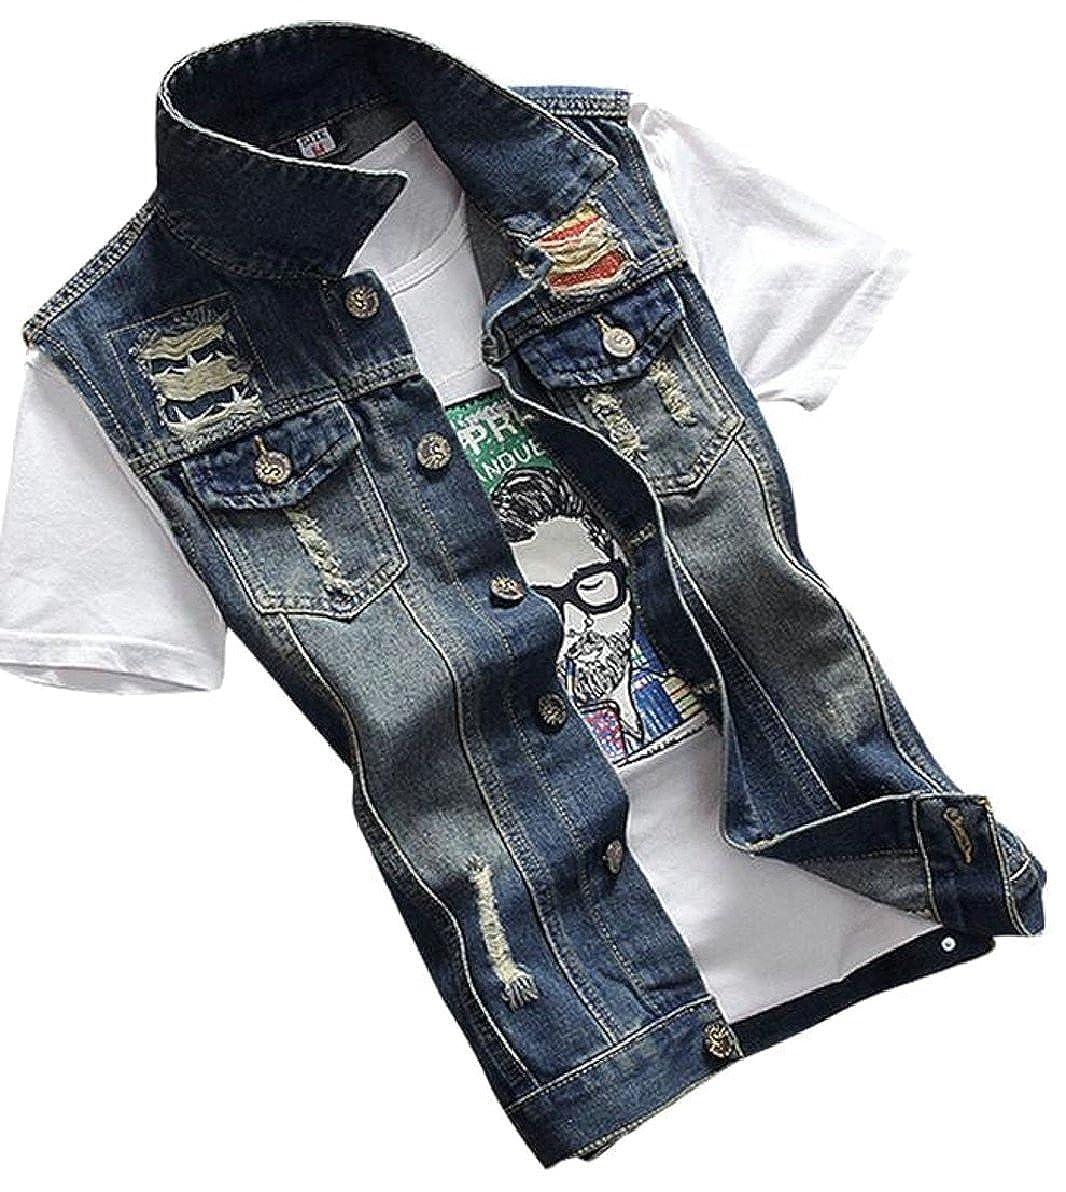 ZXFHZS-CA Mens Classic Sleeveless Denim Vest Jean Jacket Waistcoat Top